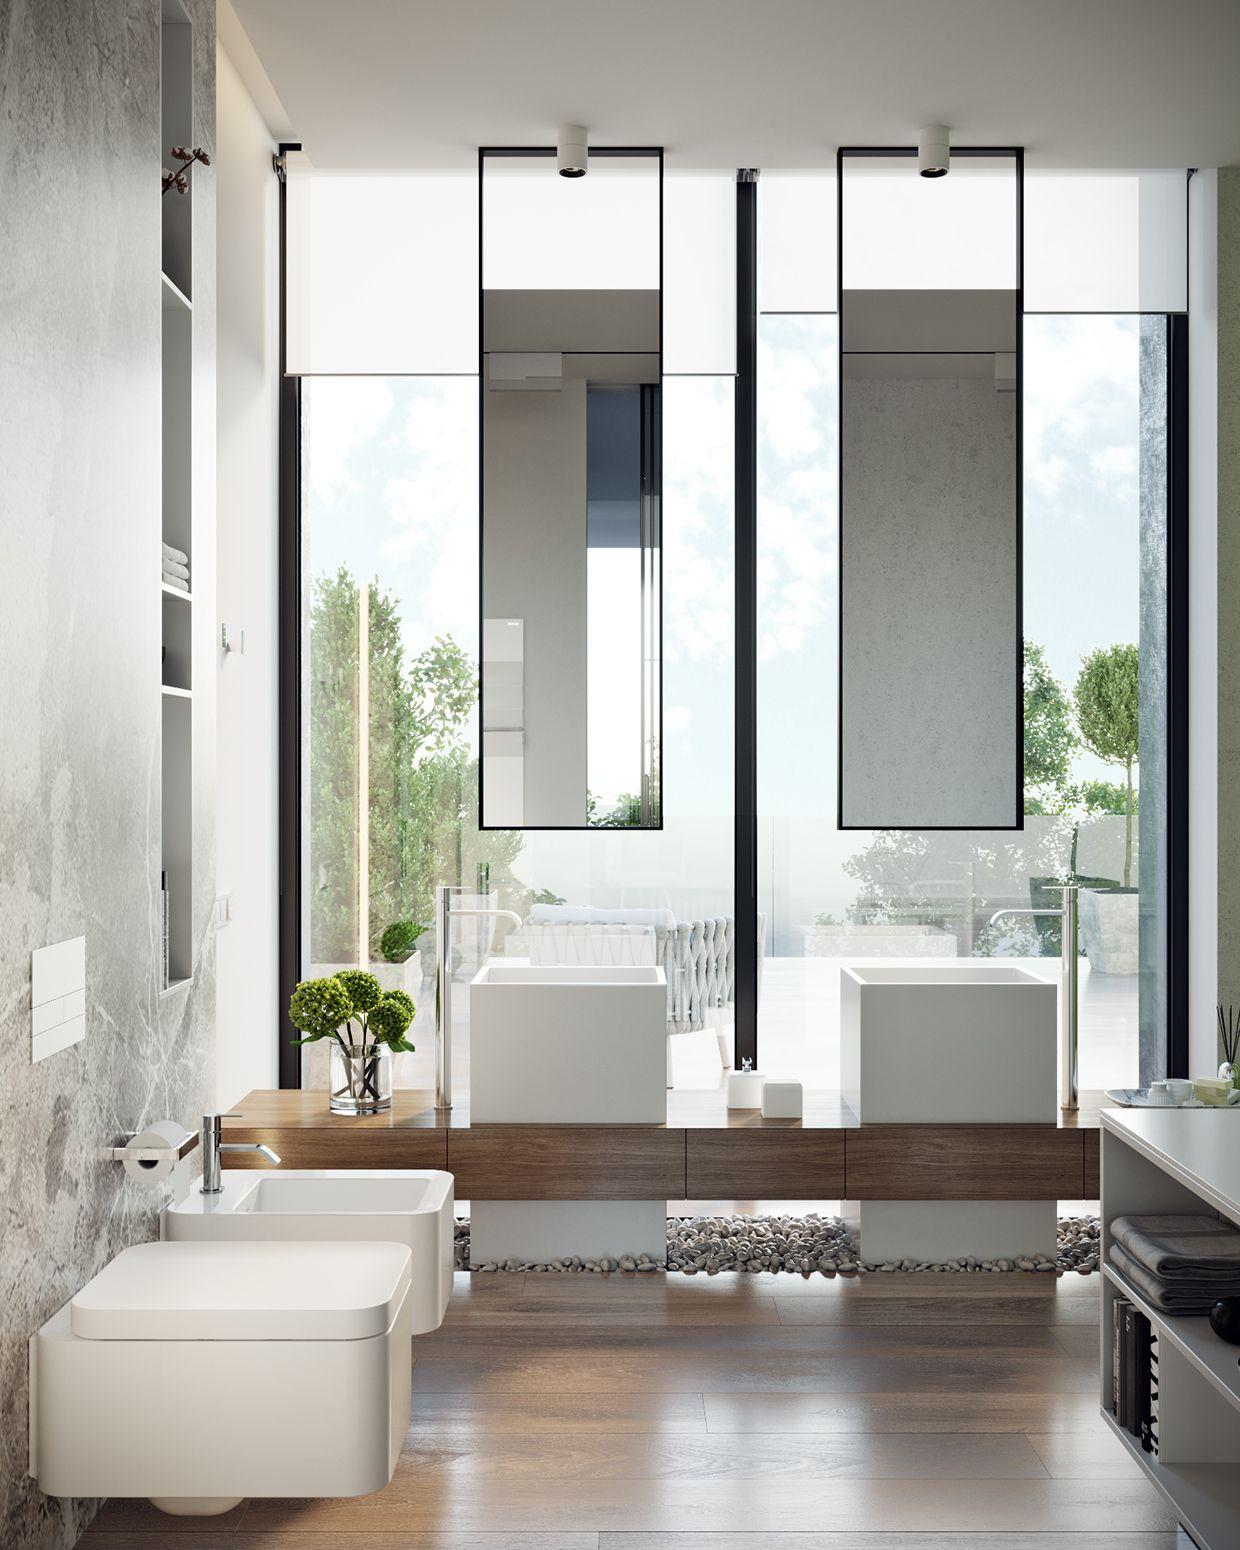 Bathroom interior hd mirscdncfhance projectmodules hd aca